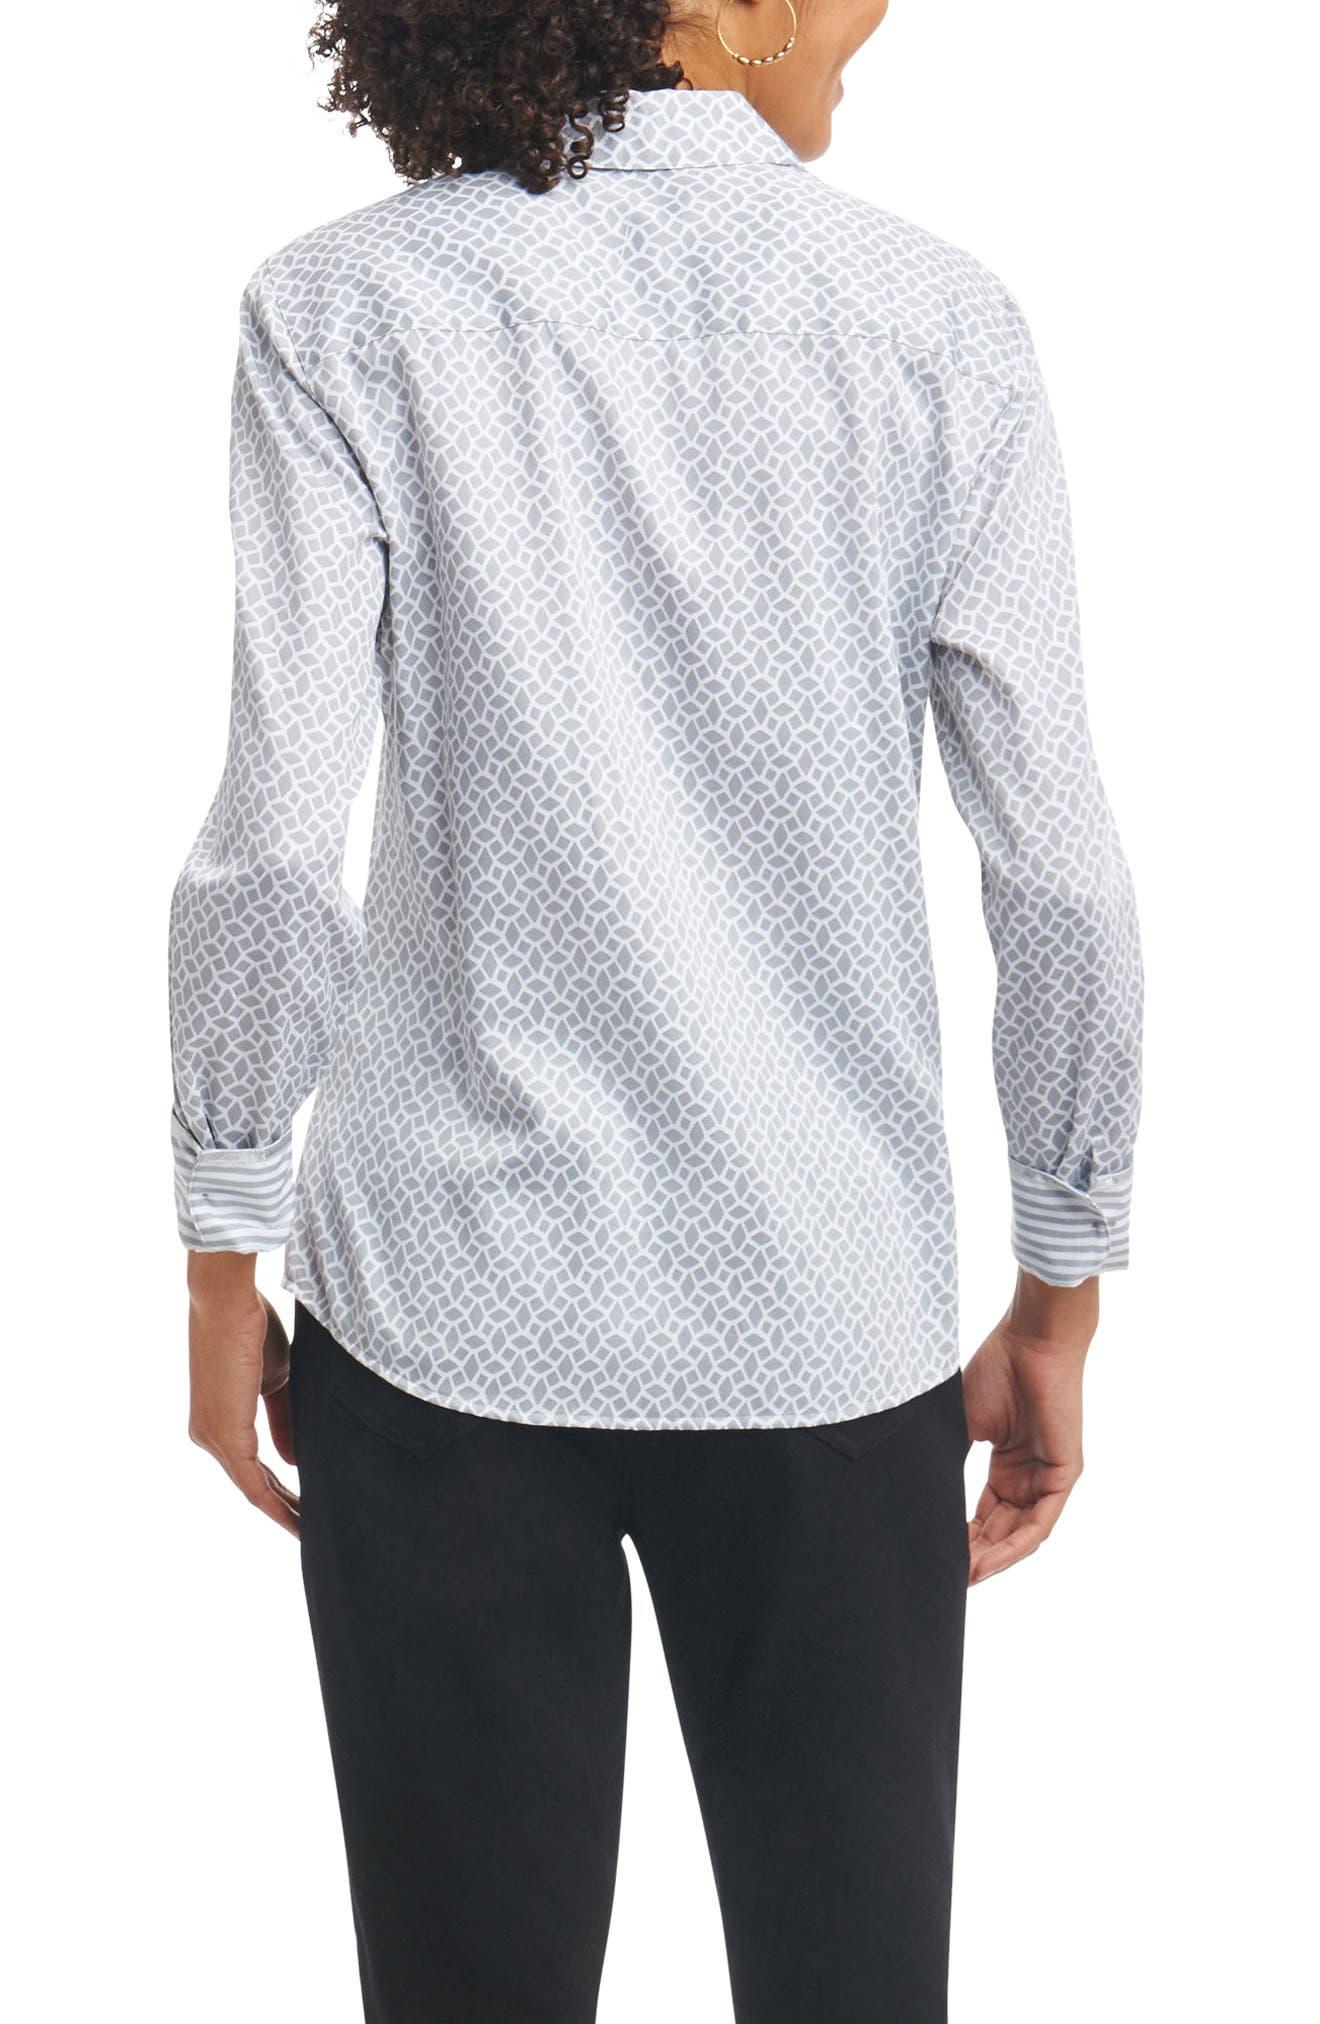 Alternate Image 2  - Foxcroft Ava Wrinkle Free Geo Print Shirt